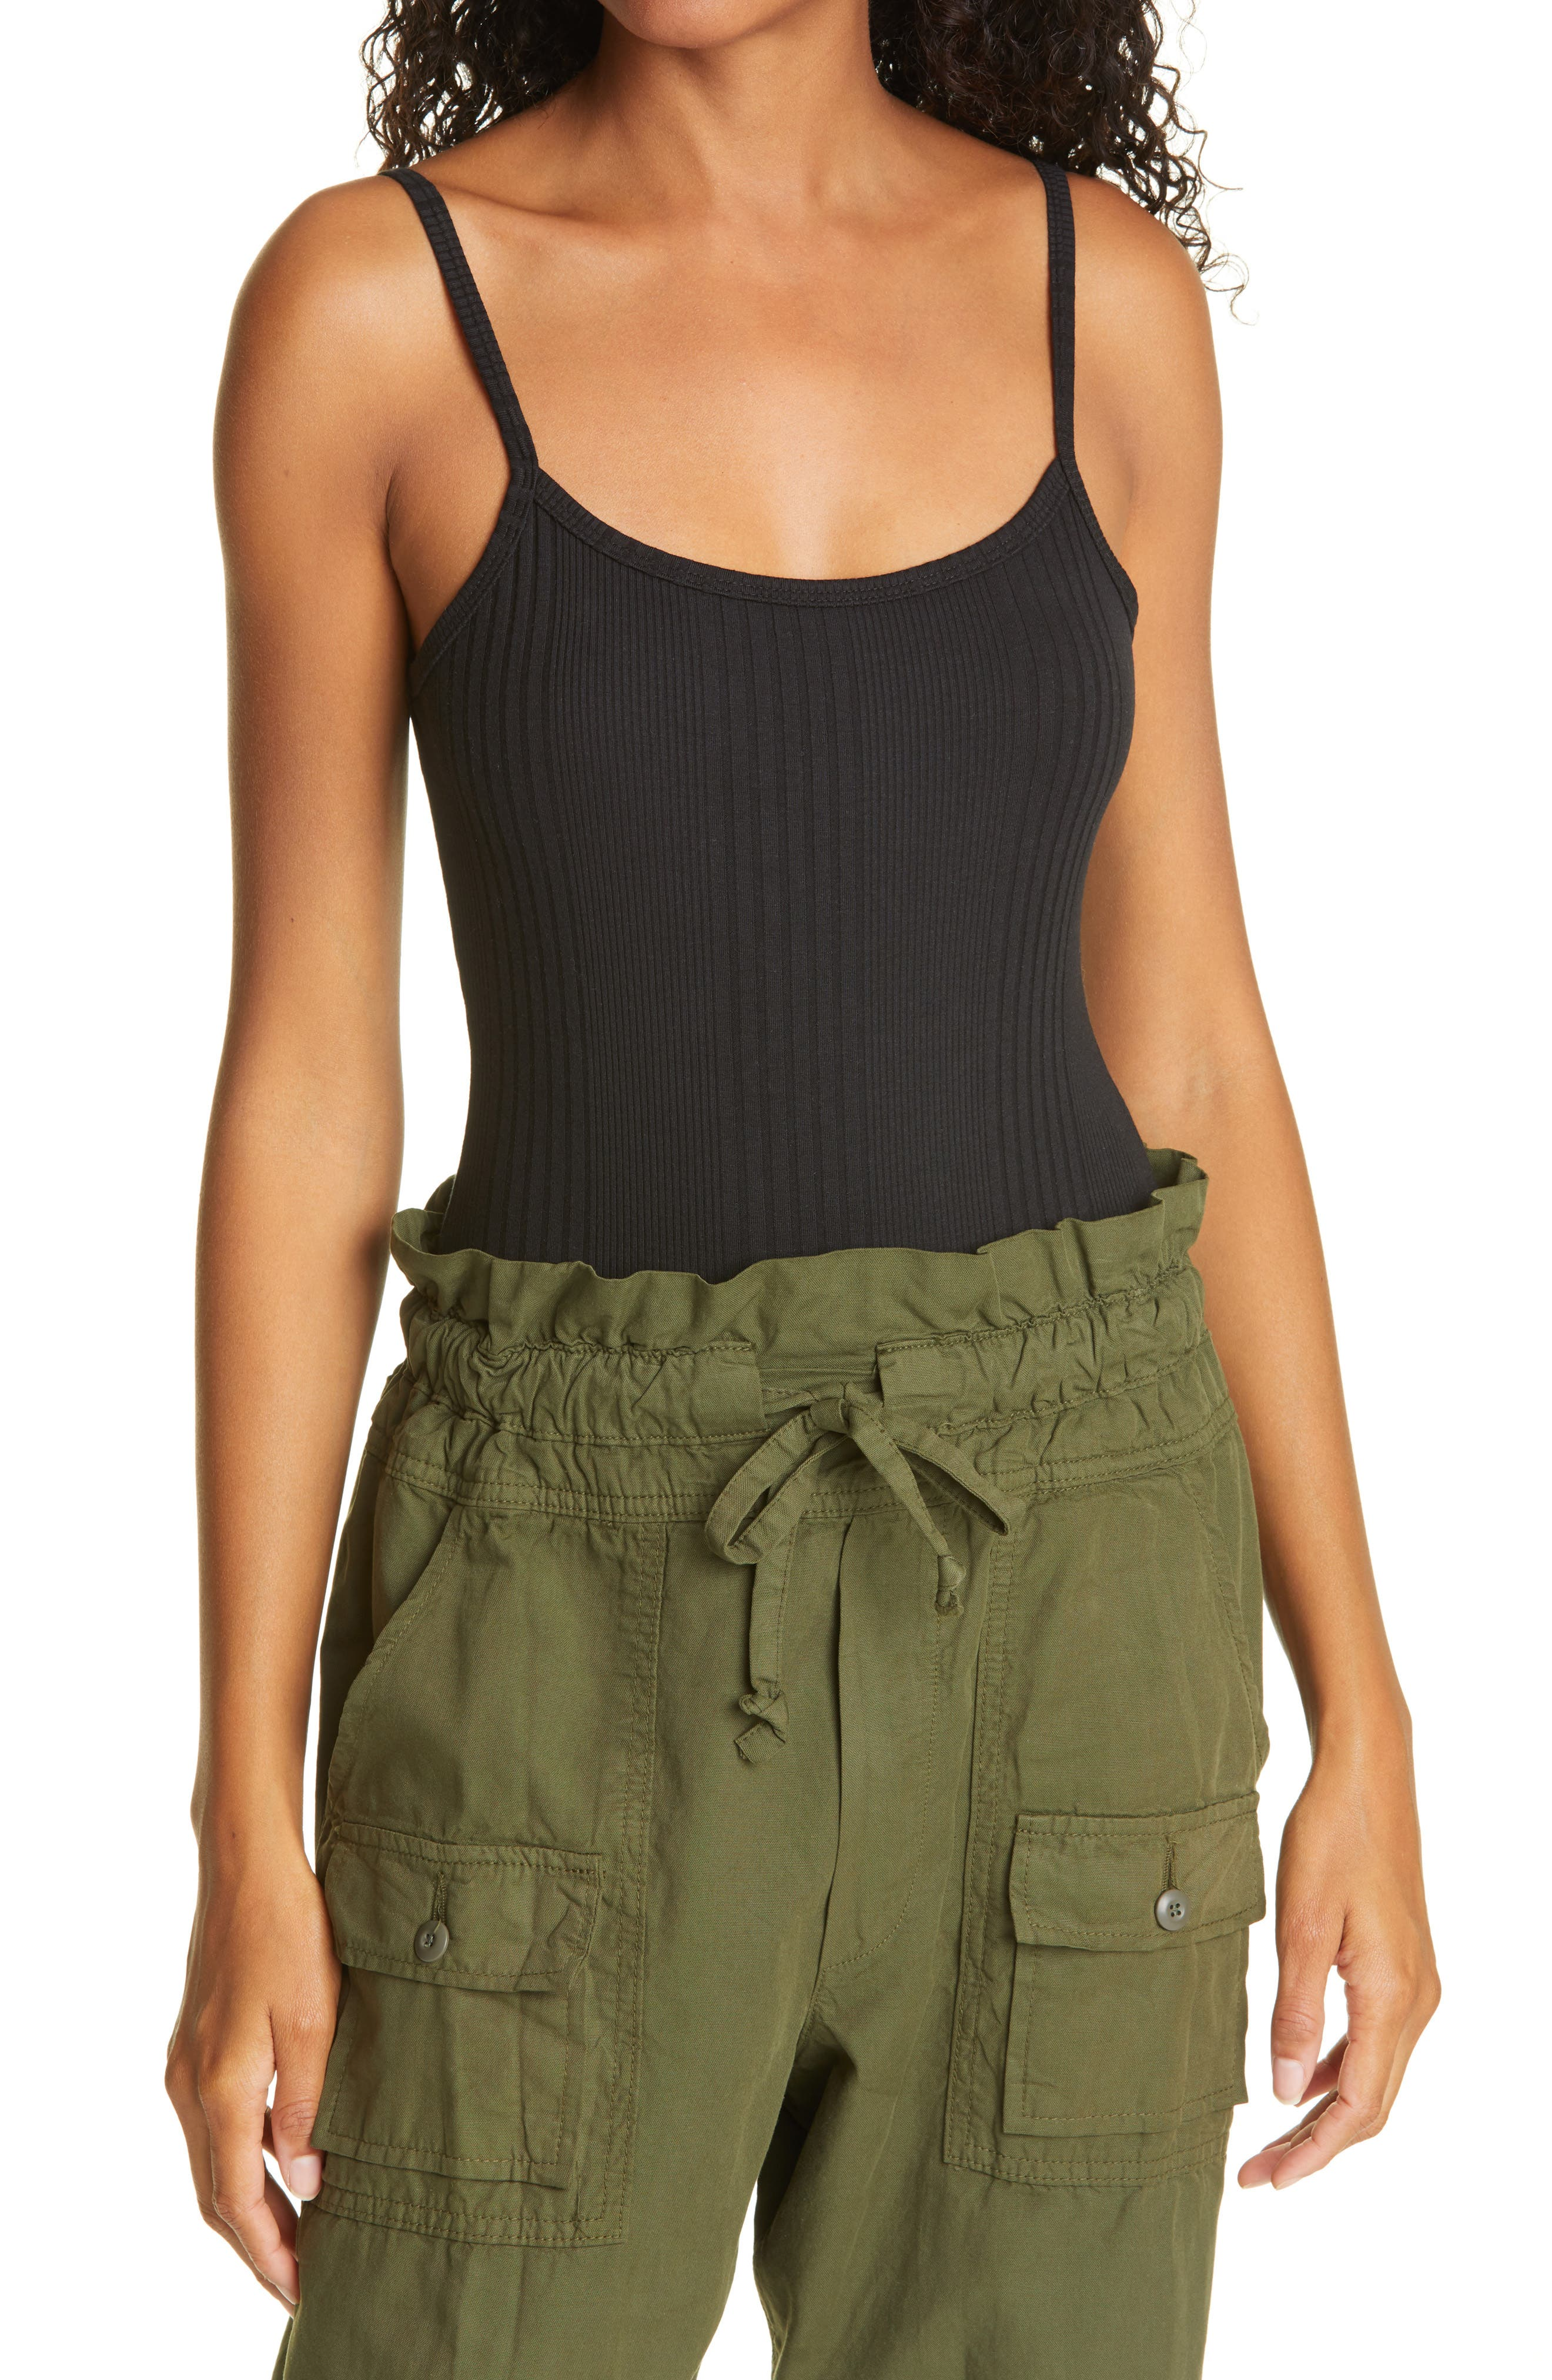 Image of NSF CLOTHING Nina Tank Bodysuit